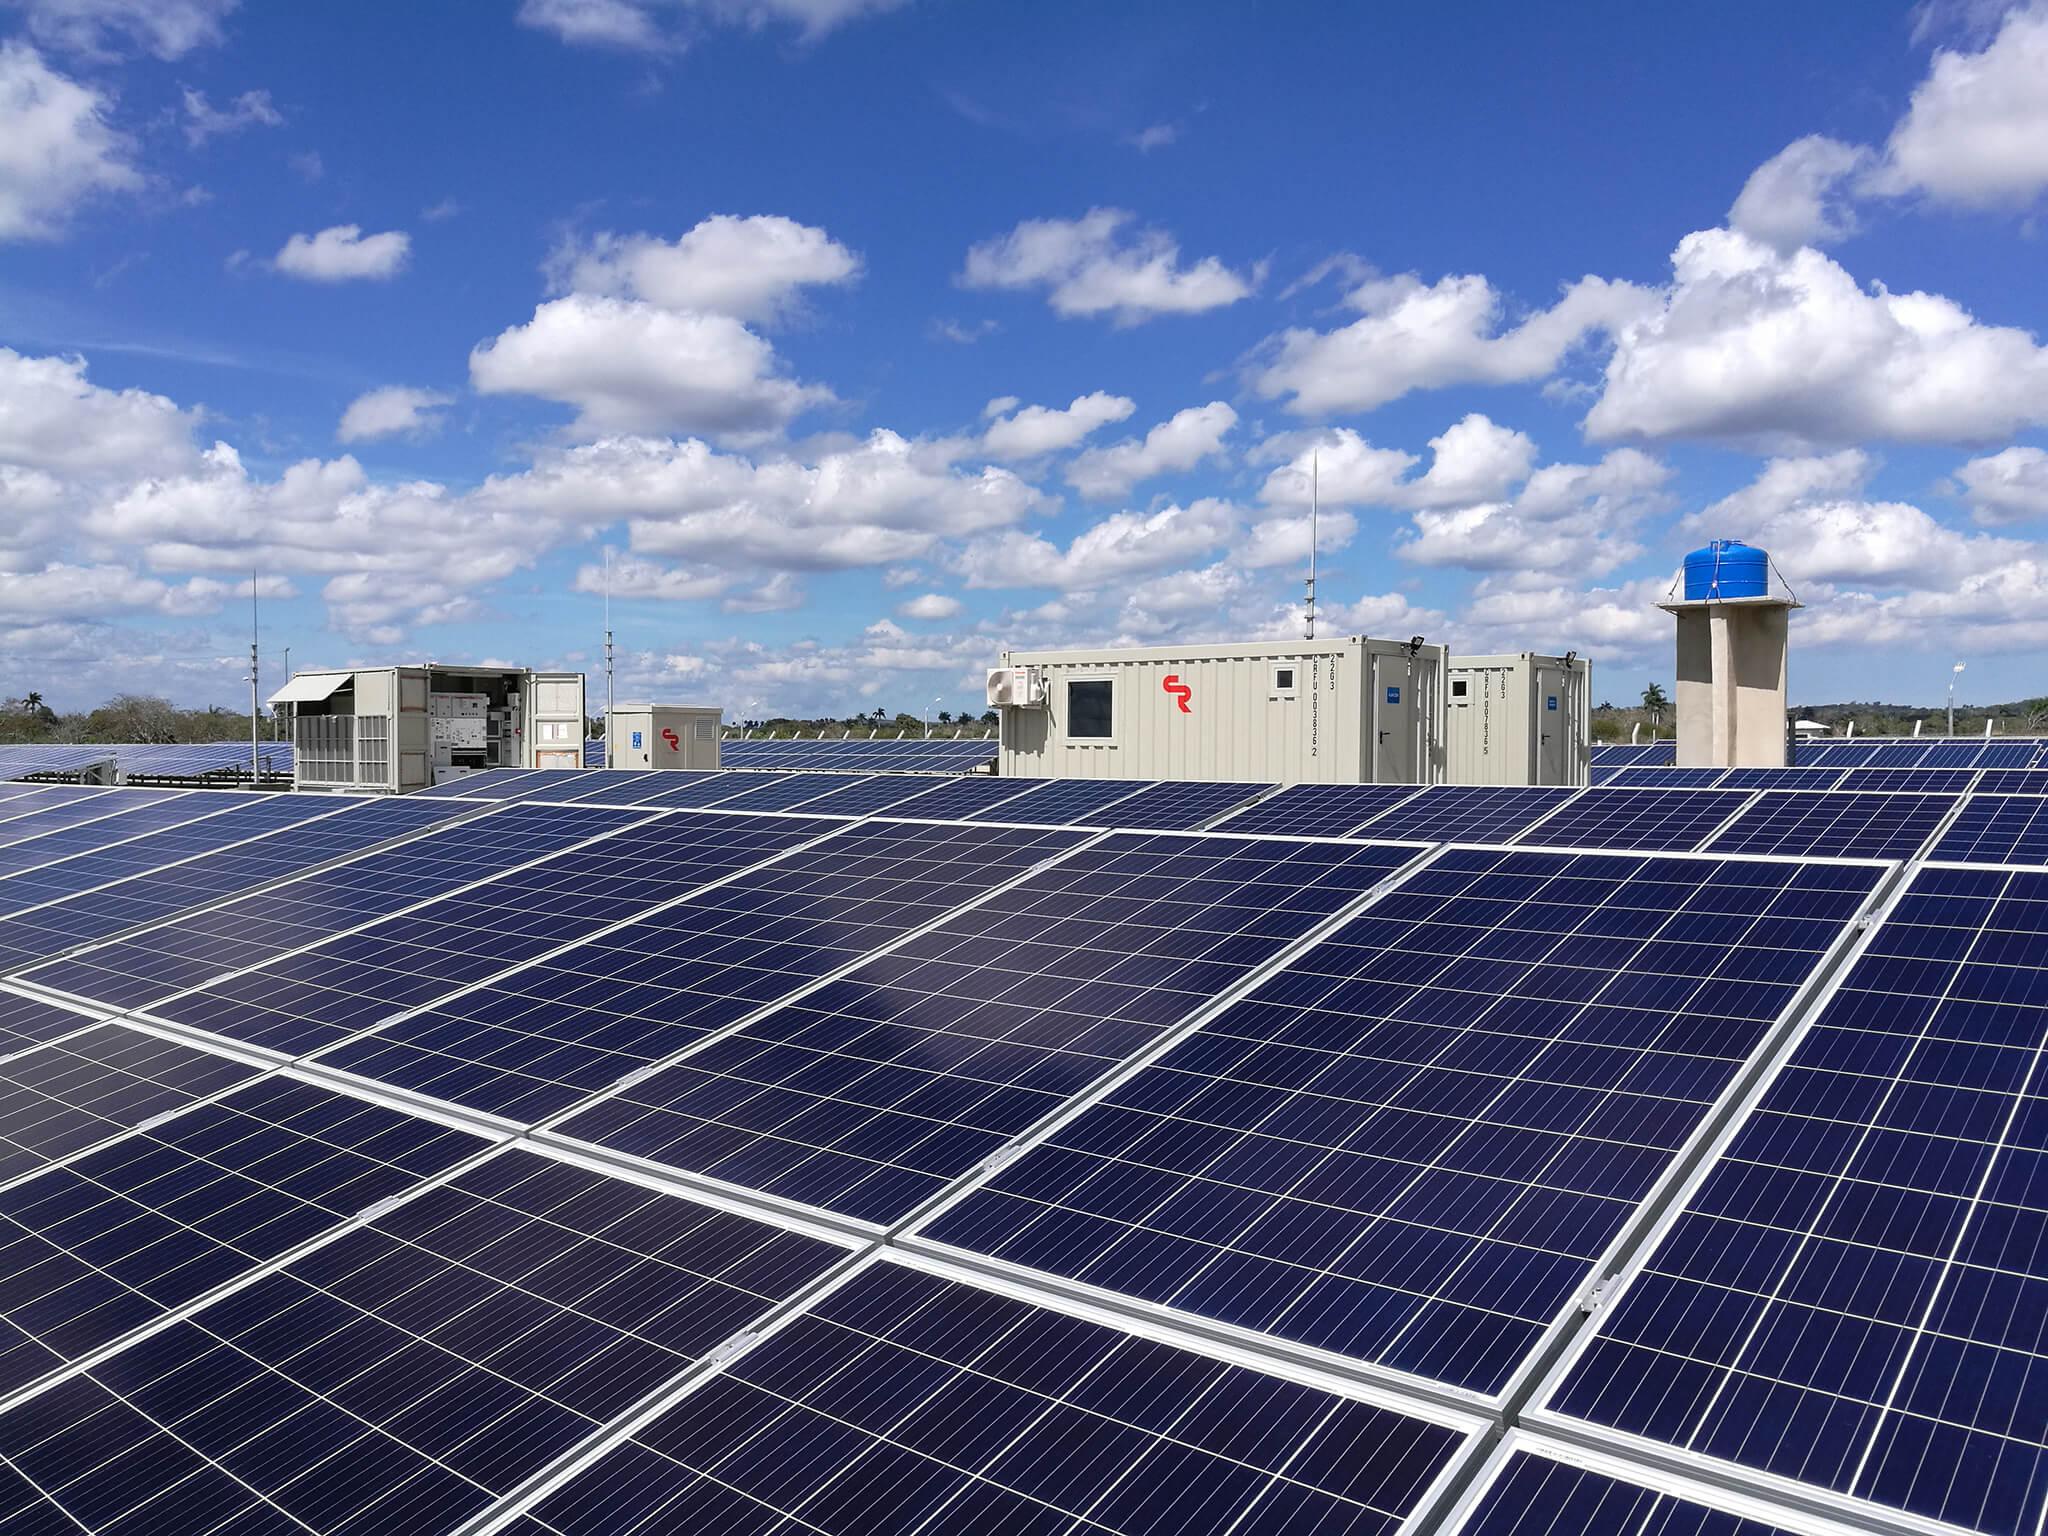 Sistema Fotovoltaico FV en America